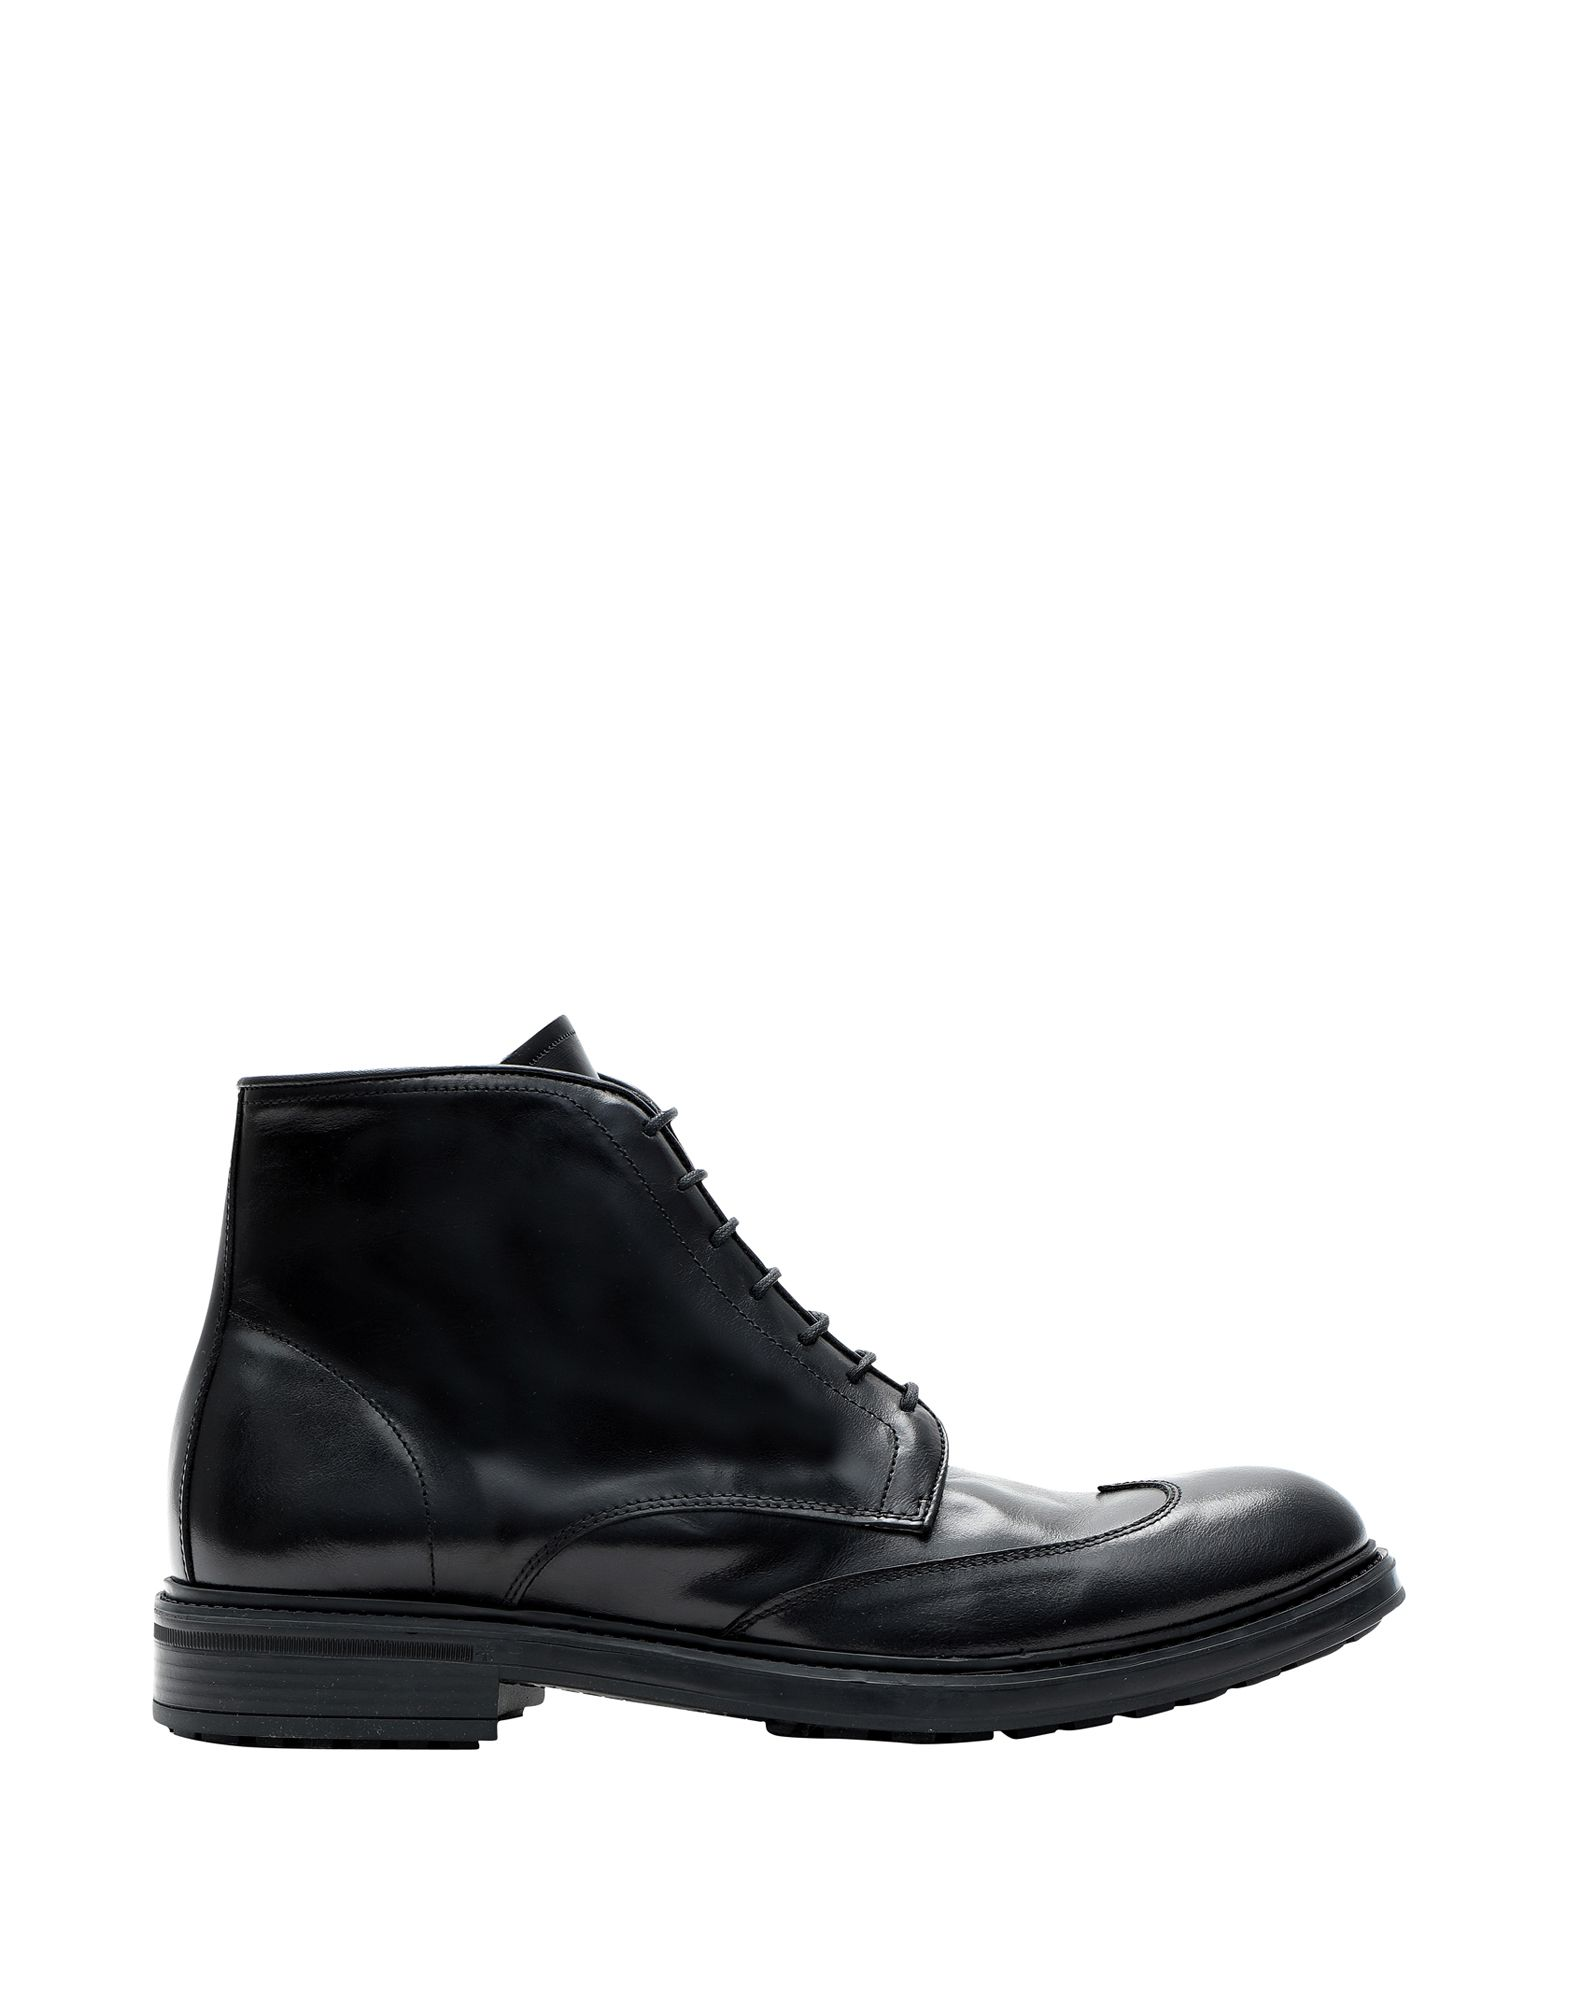 EVEET Boots in Black